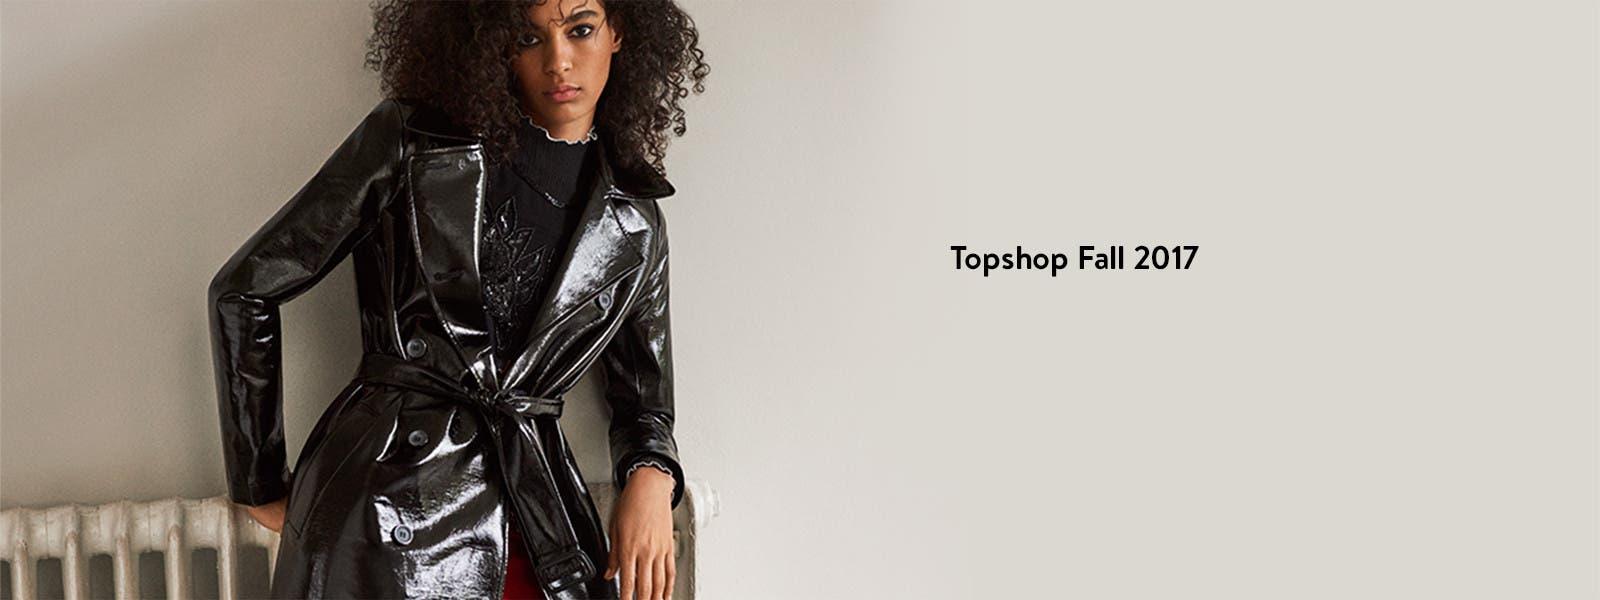 Topshop Fall 2017 clothing.